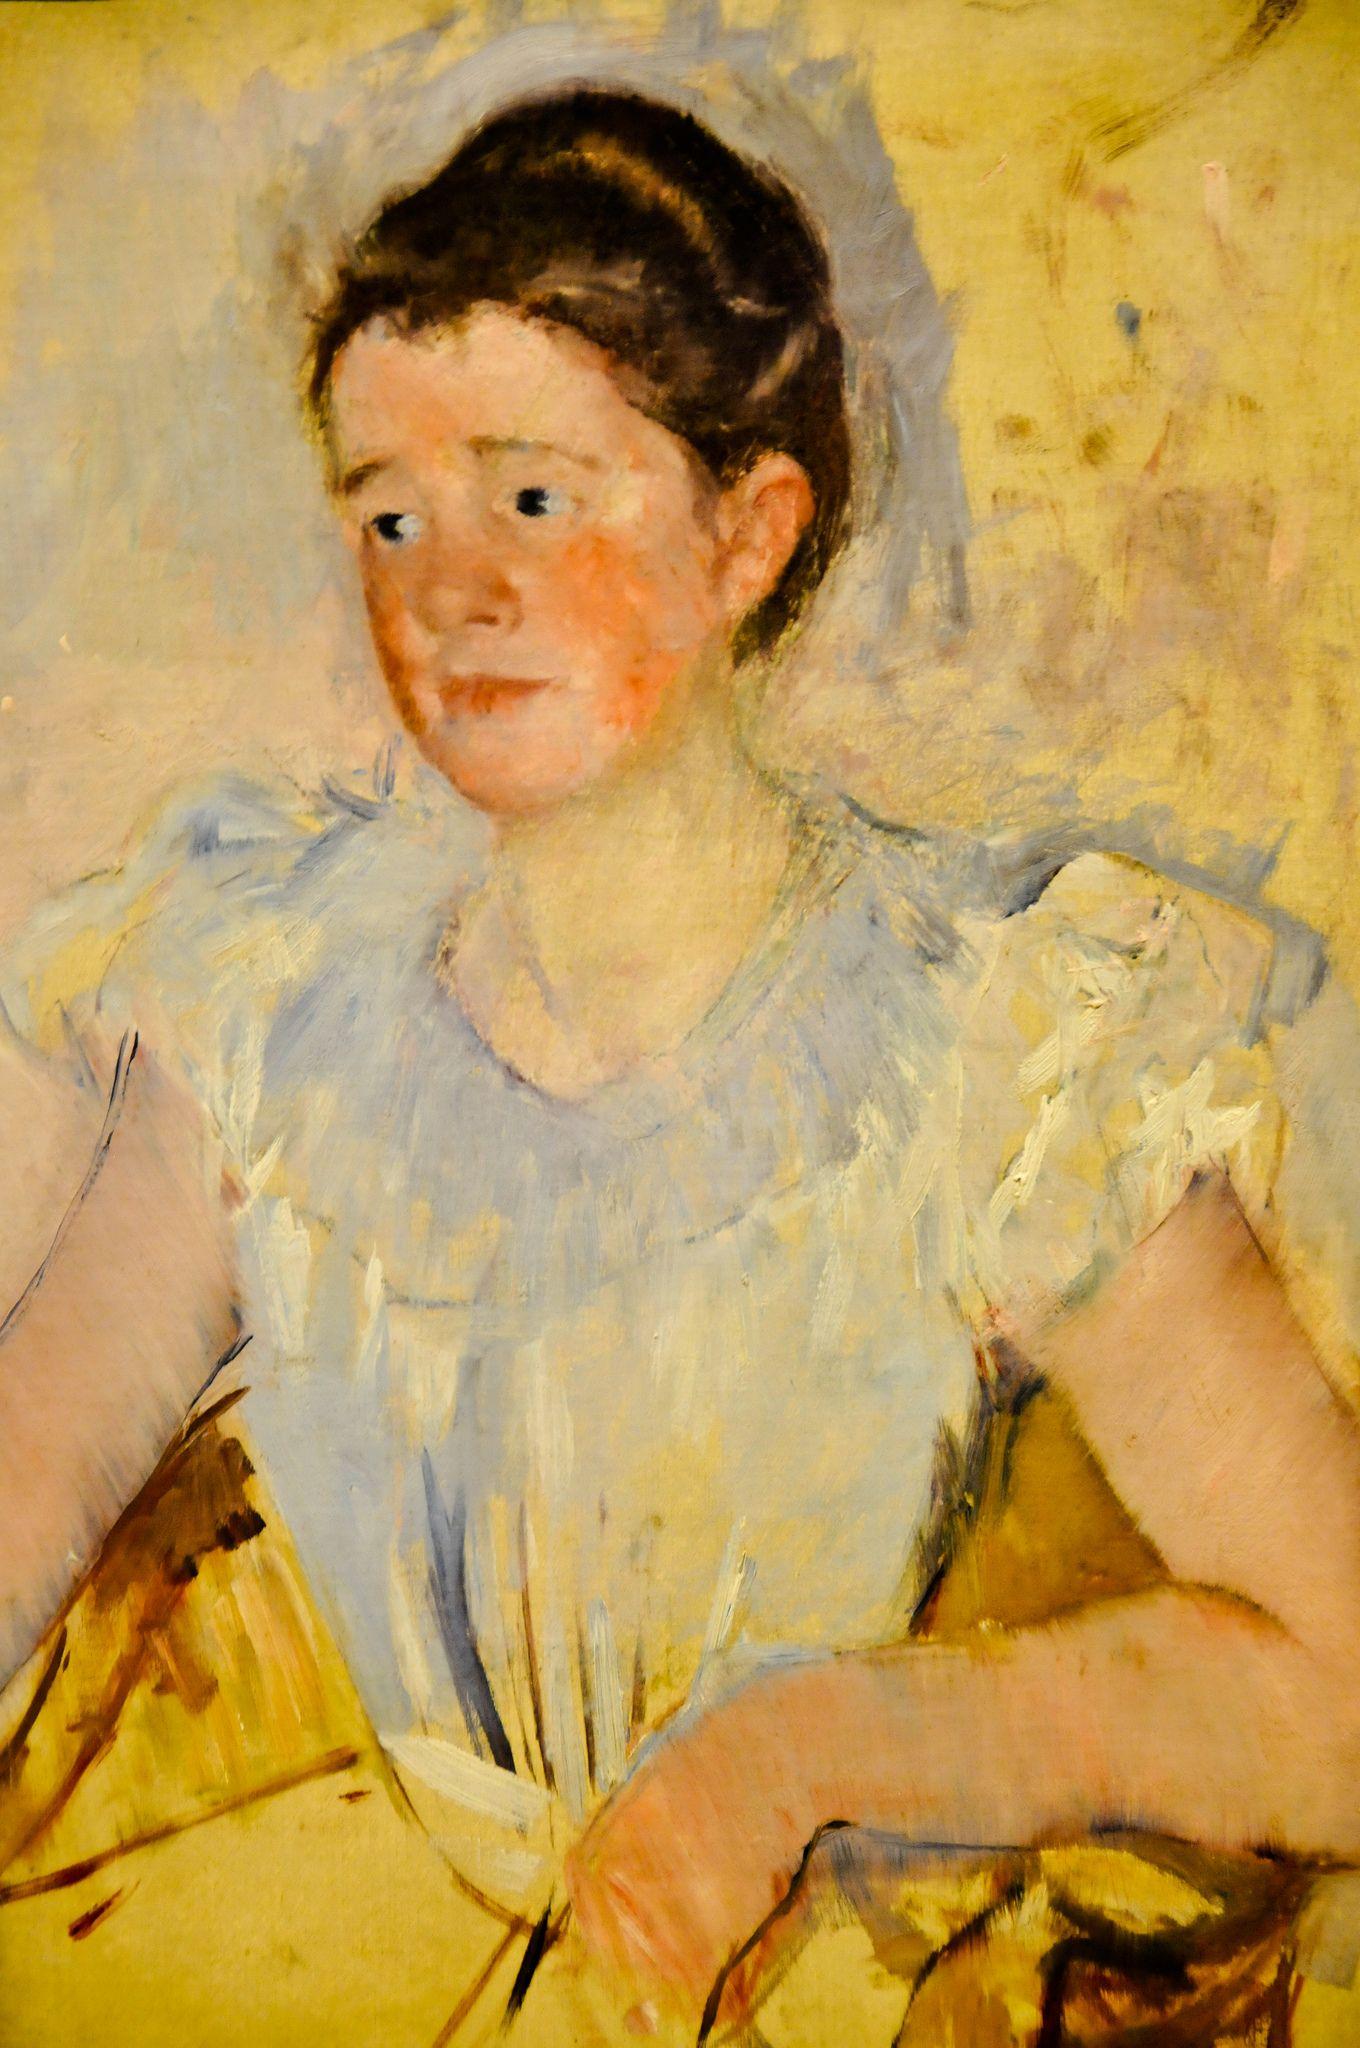 Mary Cassatt - Buste d'une femme en corsage blanc (Portrait of Katherine Cassatt), 1905 at National Museum of Women in the Arts Washington DC | by mbell1975